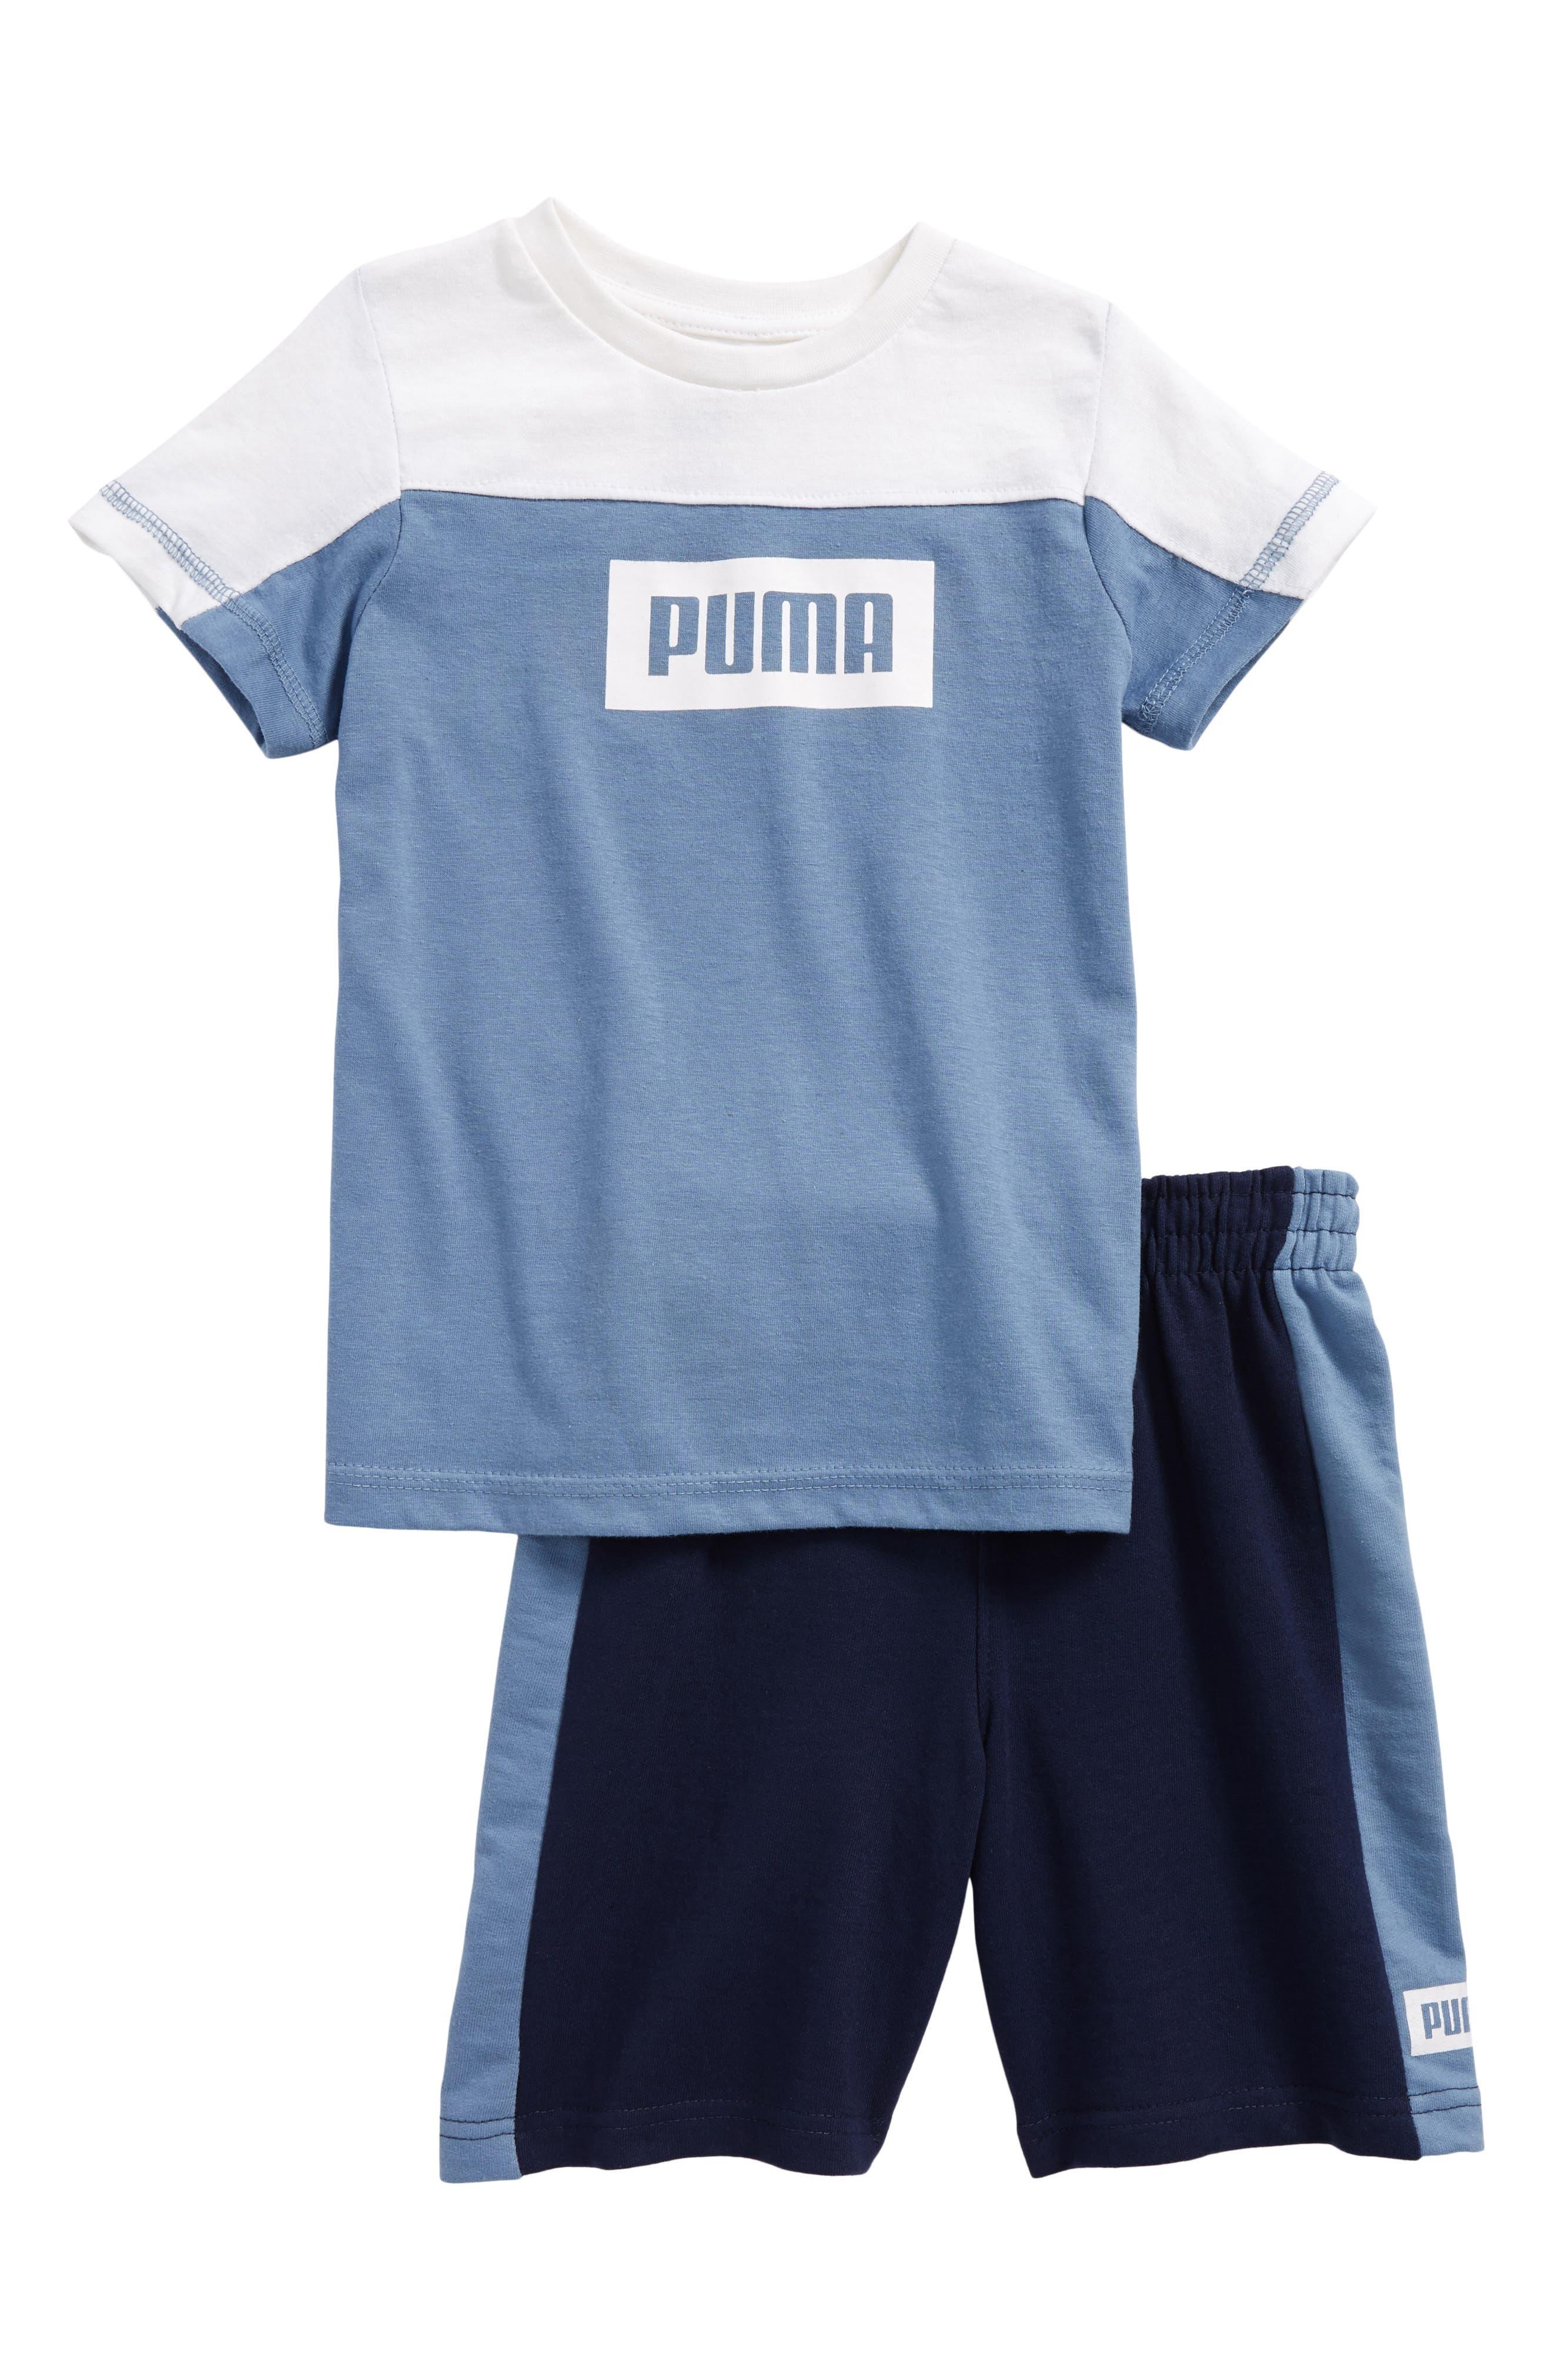 Alternate Image 1 Selected - PUMA Rebel Logo T-Shirt & Shorts Set (Toddler Boys & Little Boys)